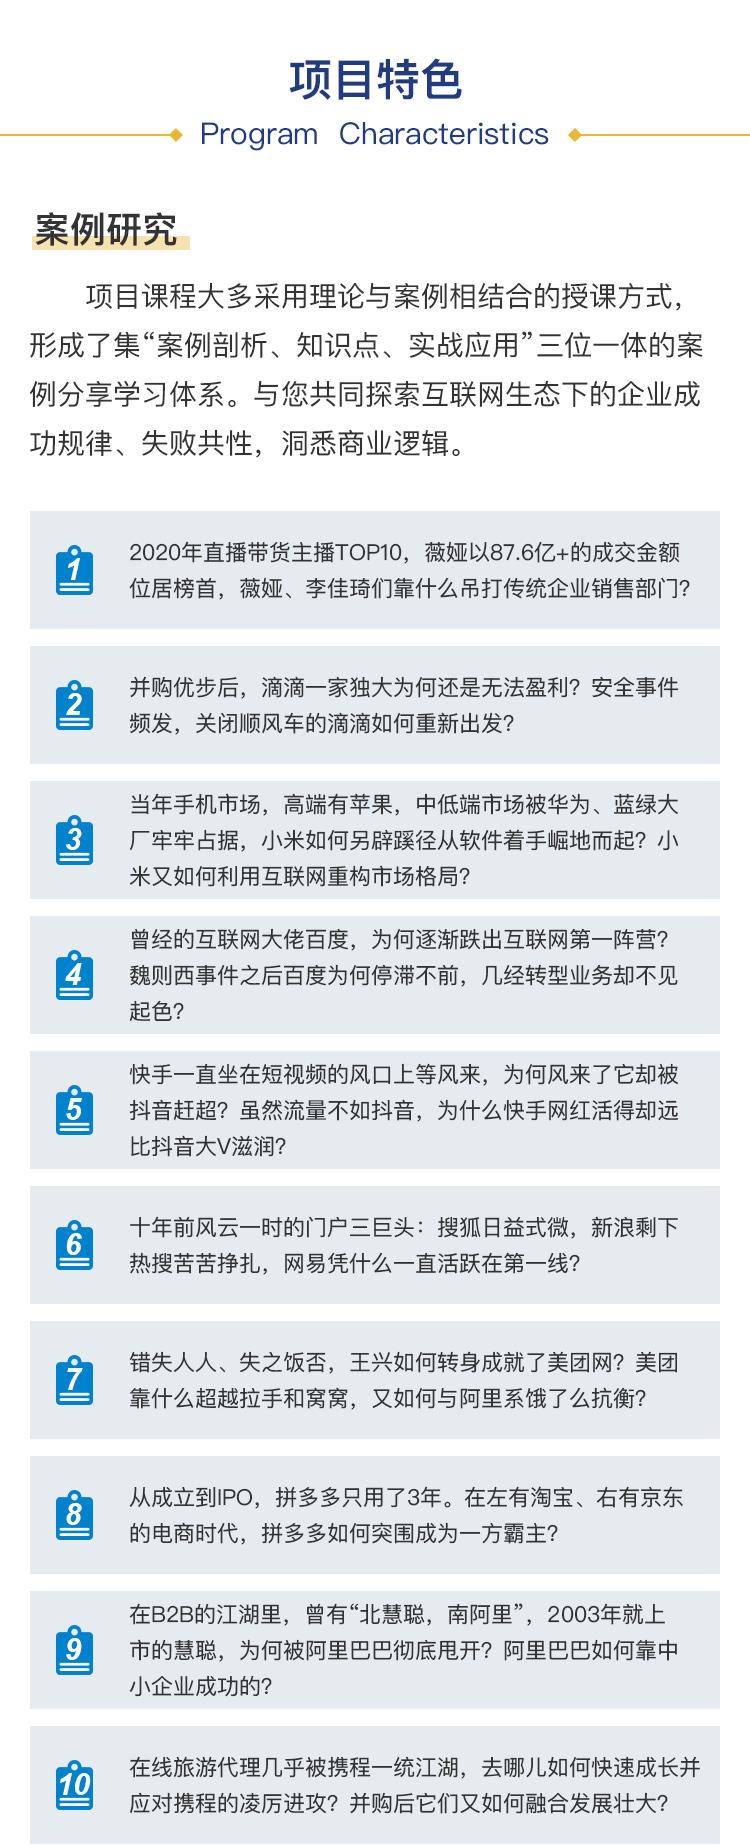 http://www.huodongxing.com/file/20210623/3634191590865/394299392610618.jpg